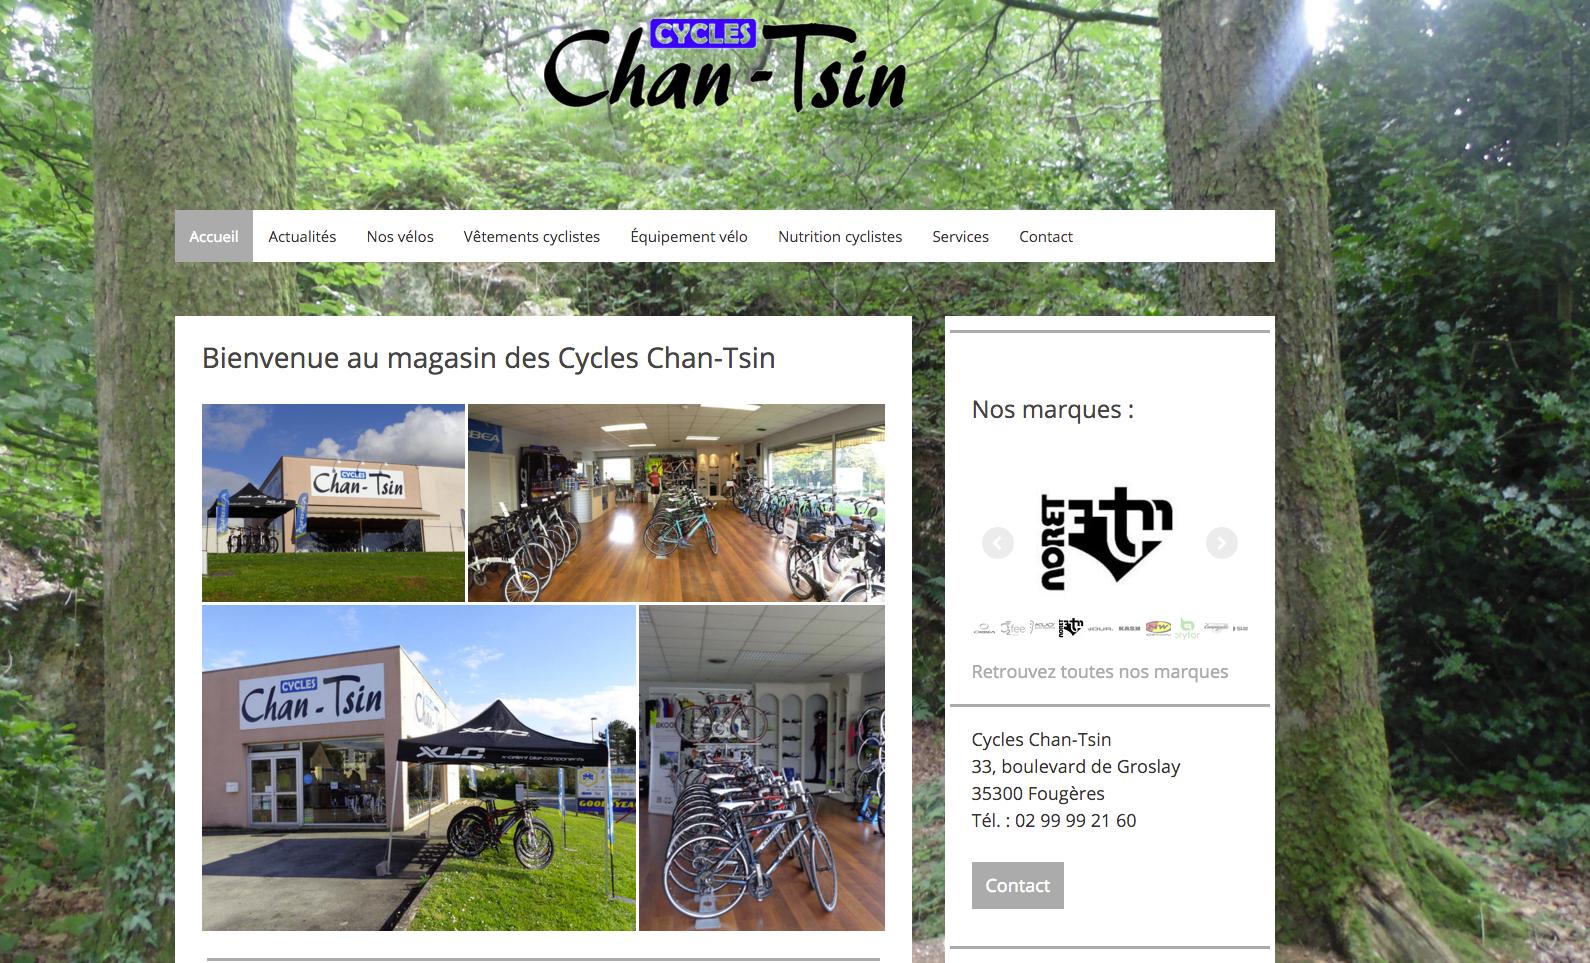 http://www.cycles-chan-tsin.fr/